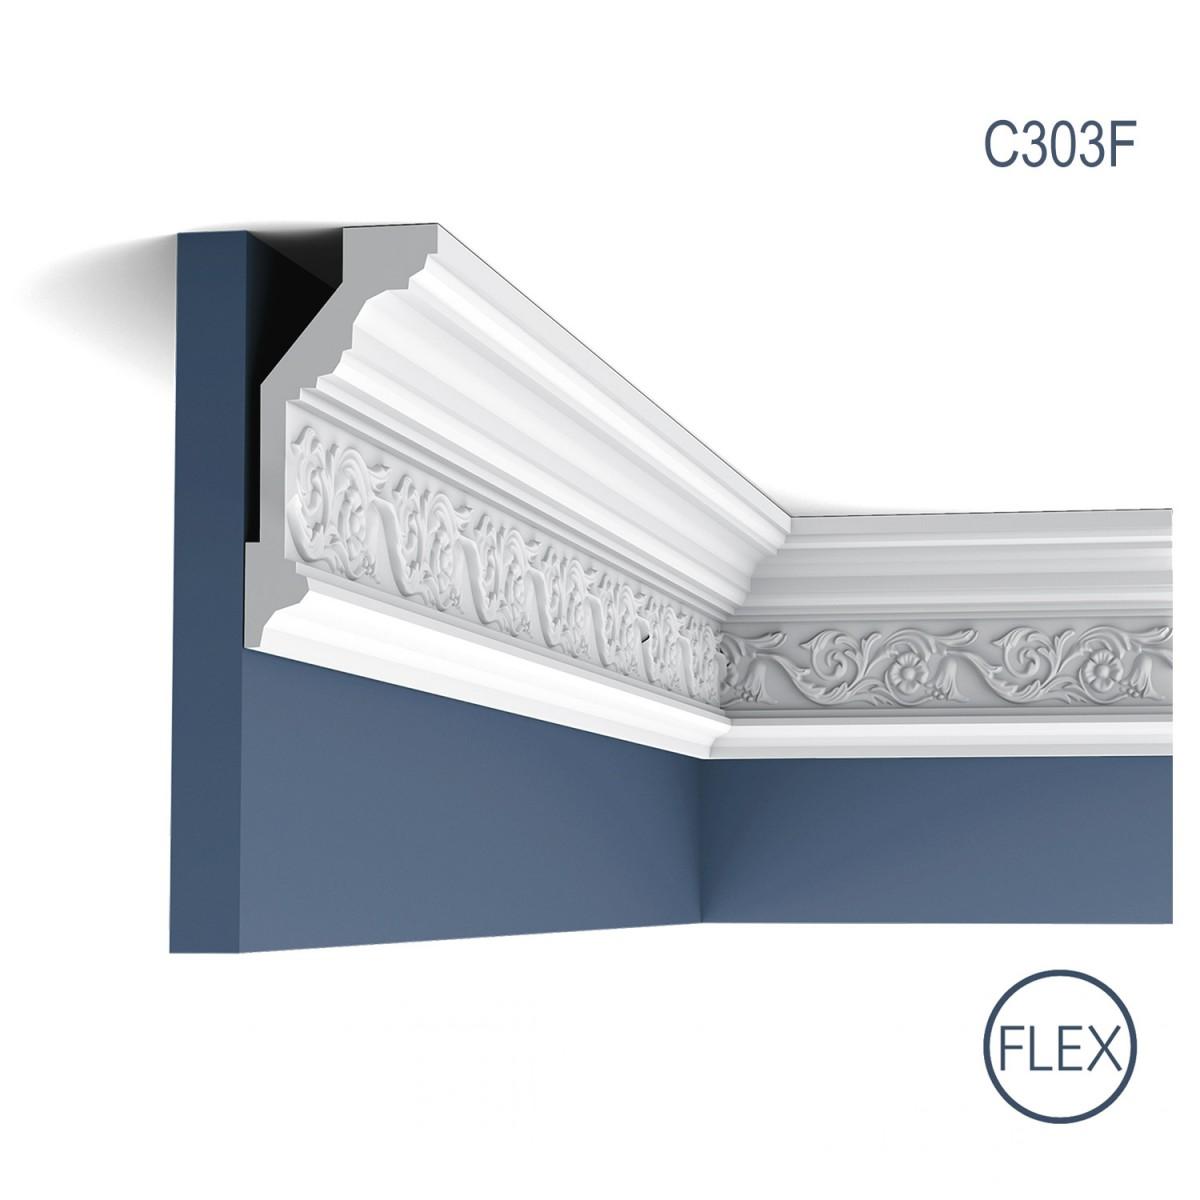 Cornisa Flex Luxxus C303F, Dimensiuni: 200 X 14.4 X 6.5 cm, Orac Decor